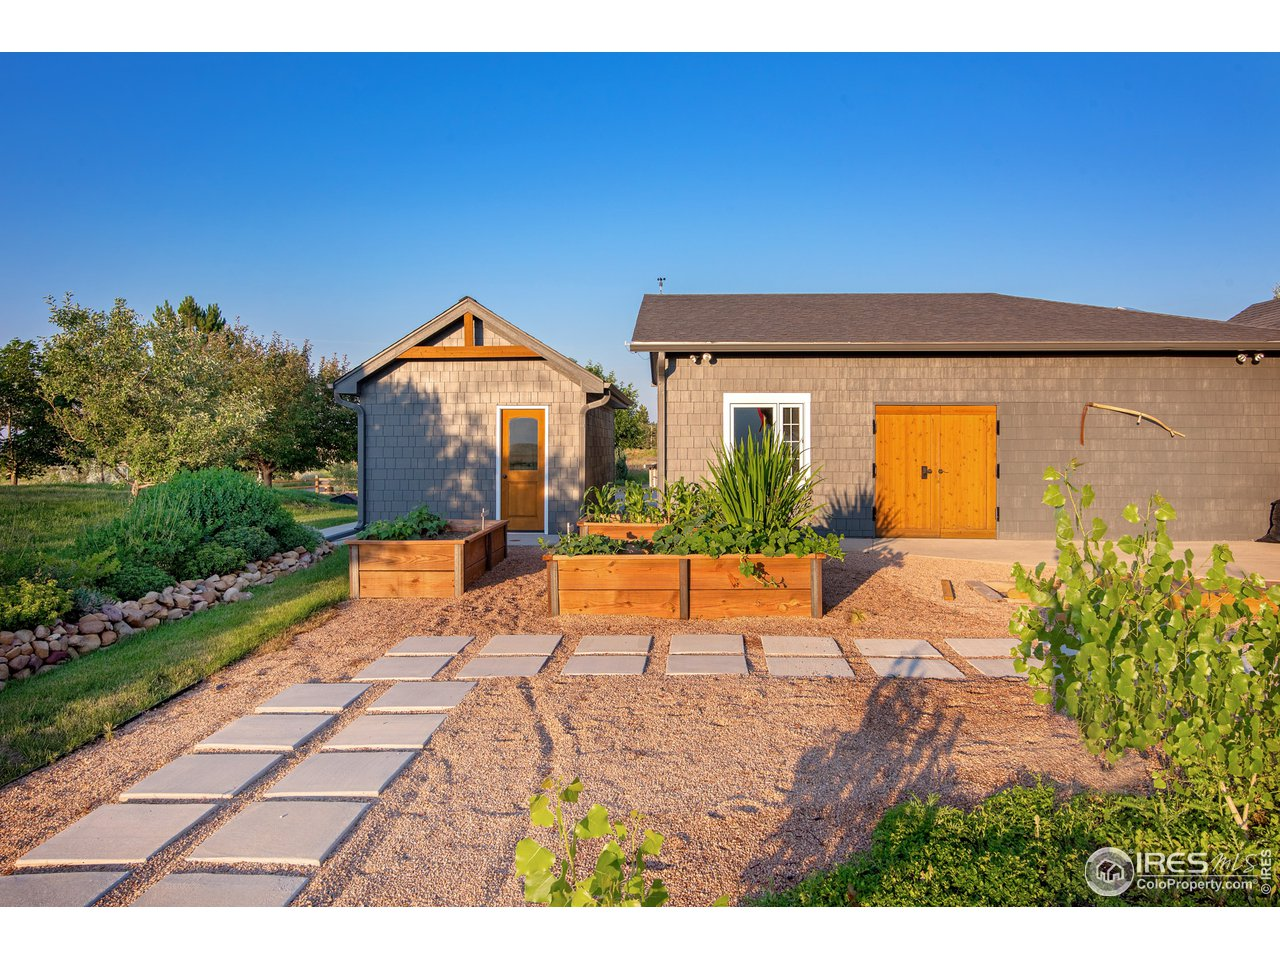 Raised Garden beds and workshop